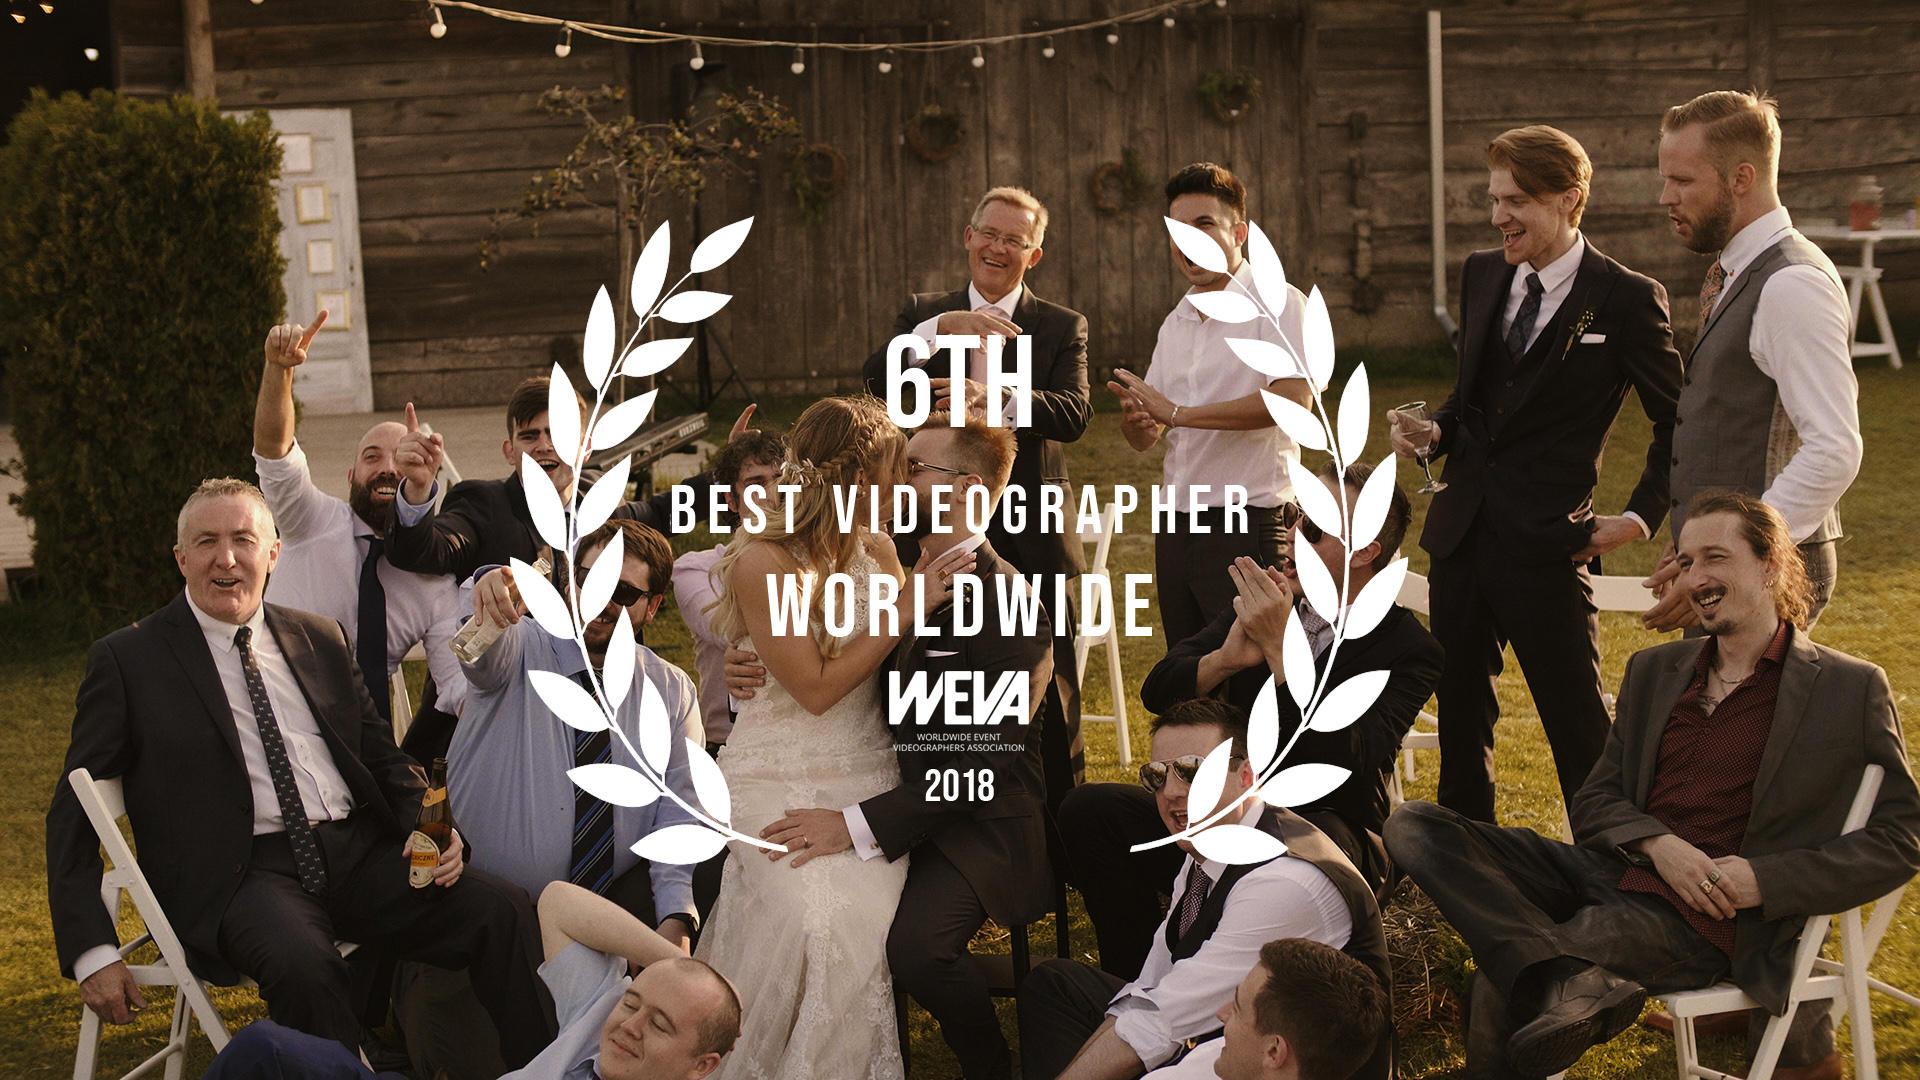 6th best videographer worldwide weva awards 2018 najlepszy filmowiec best polish videographer.jpg